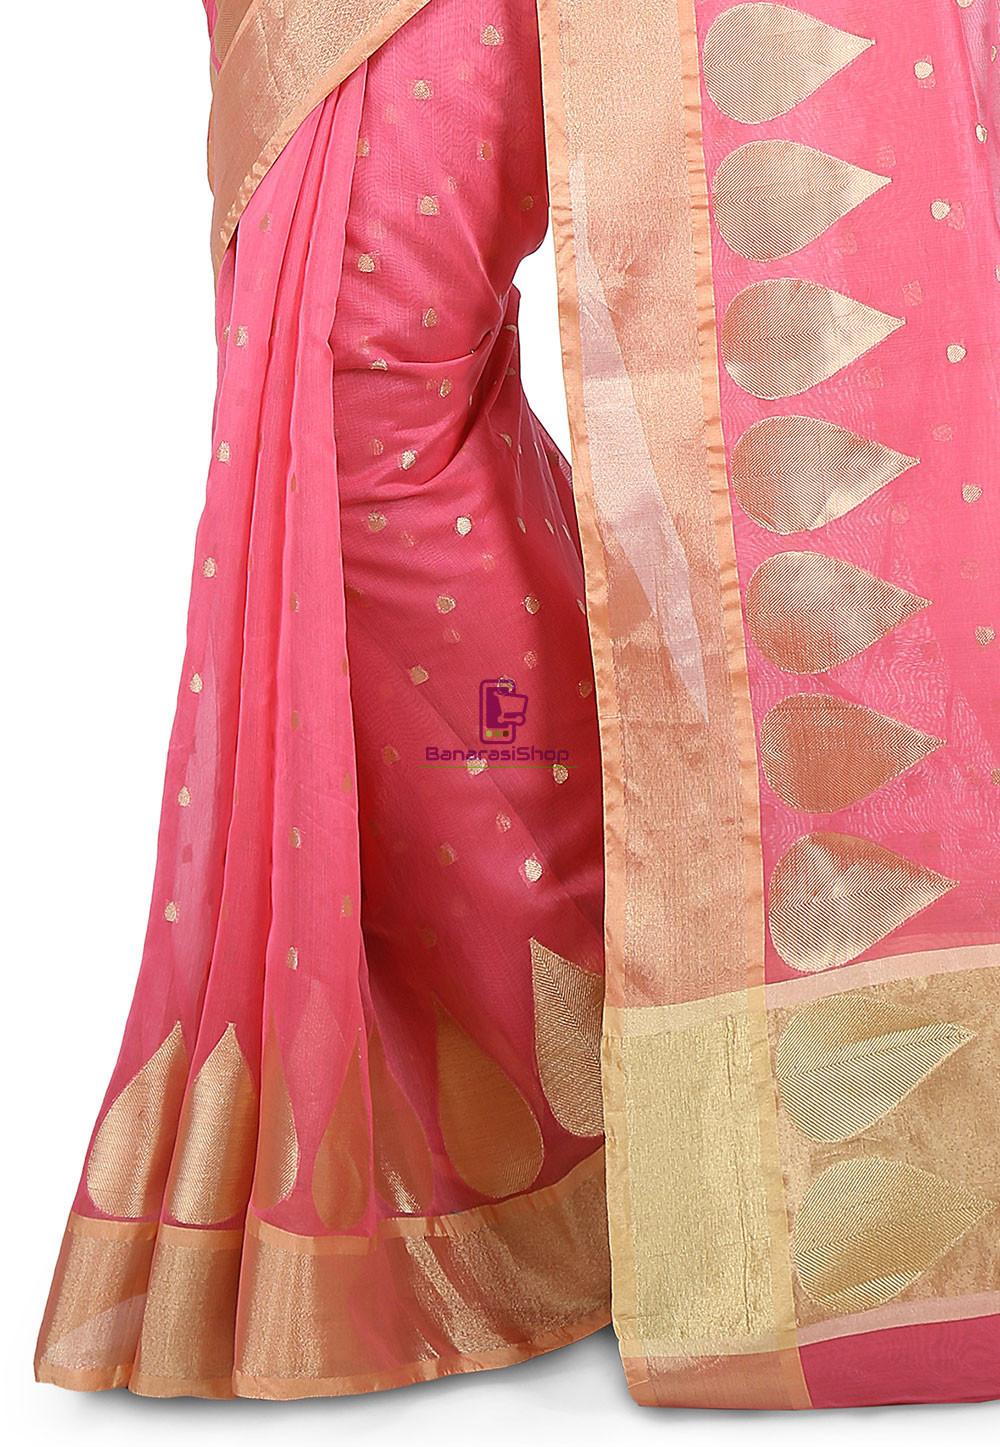 Woven Banarasi Chanderi Silk Saree in Pink 4